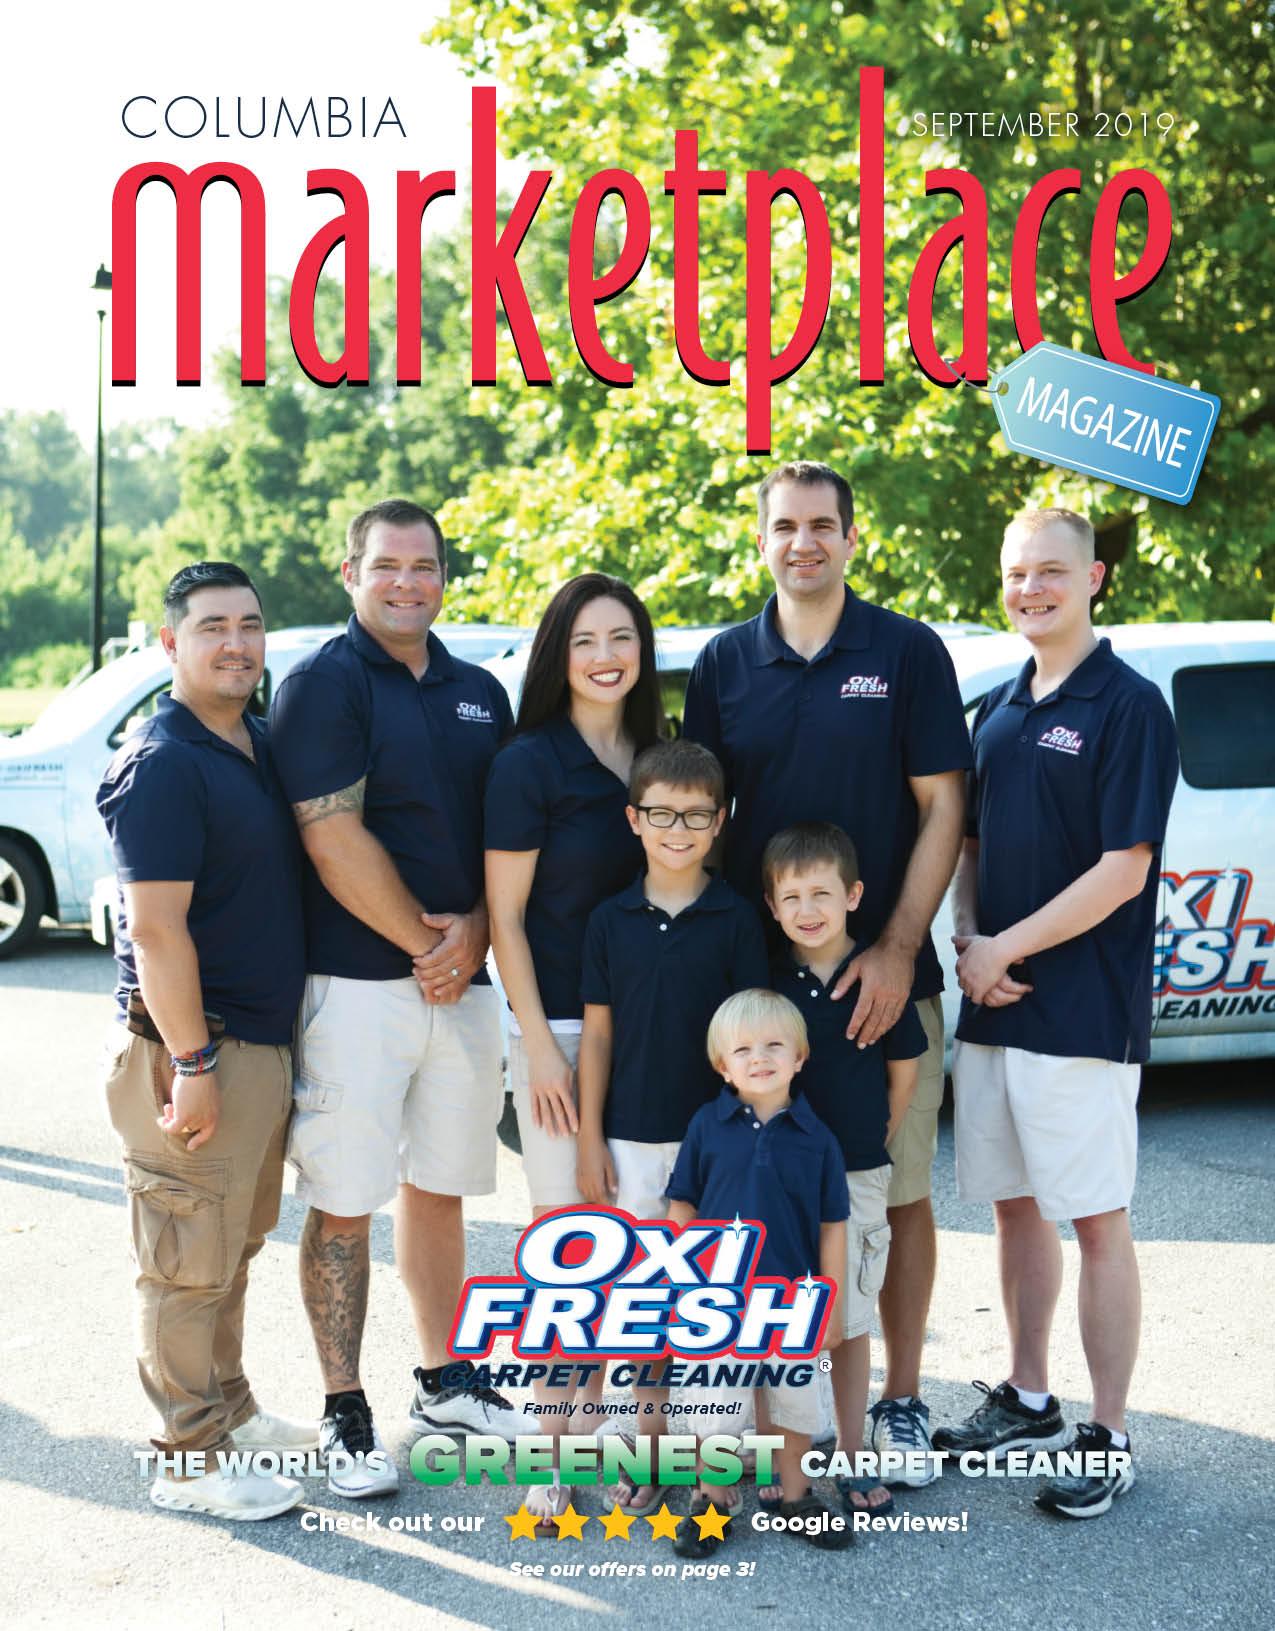 Marketplace Magazine Columbia MO September 2019 Cover